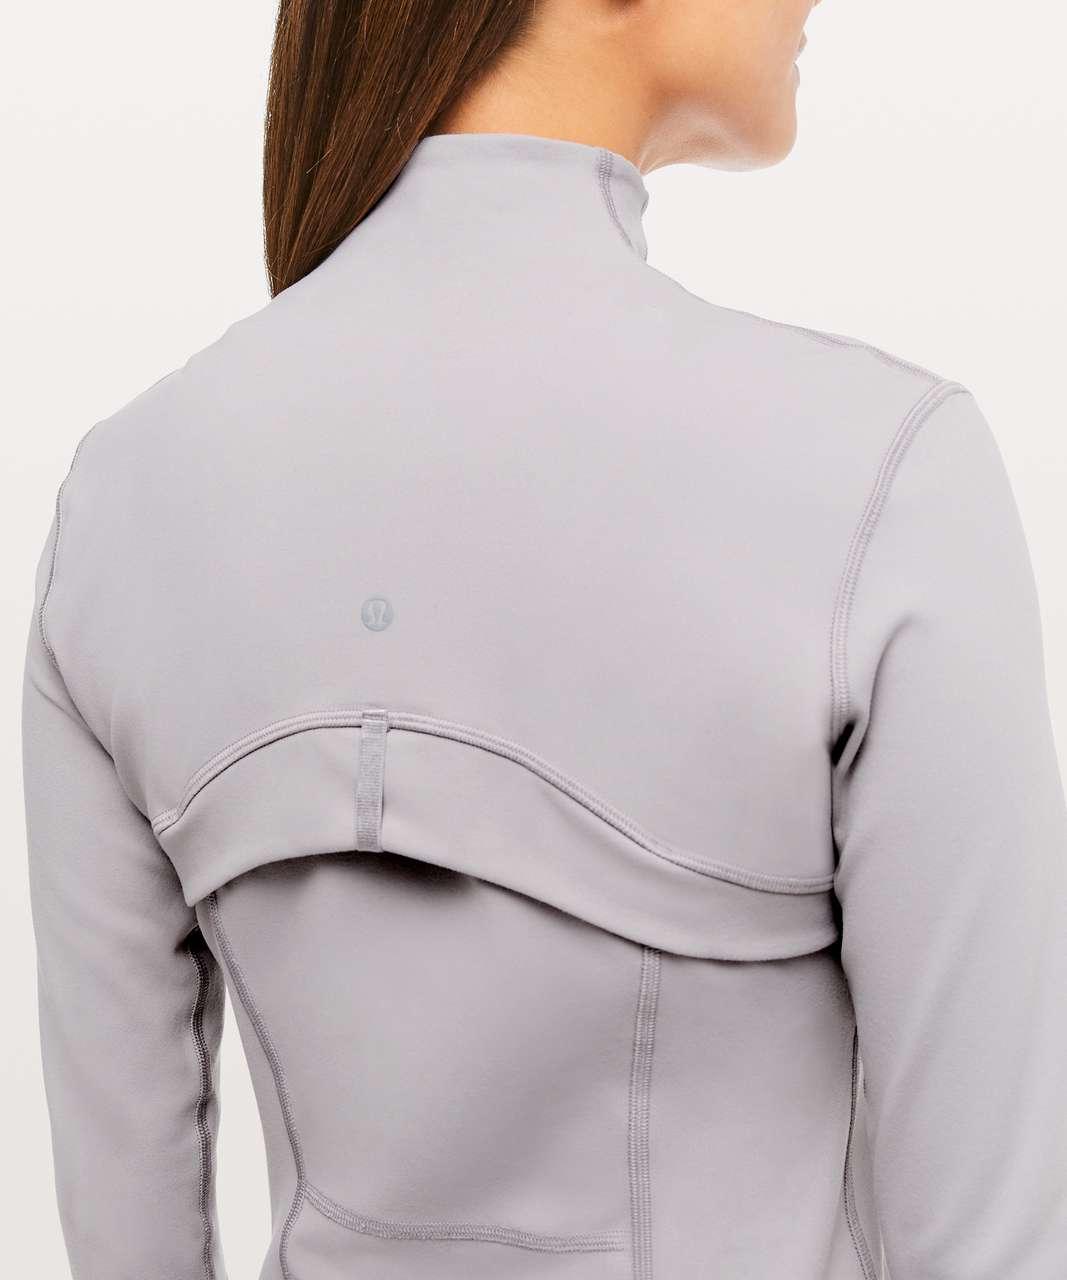 Lululemon Define Jacket - Dark Chrome